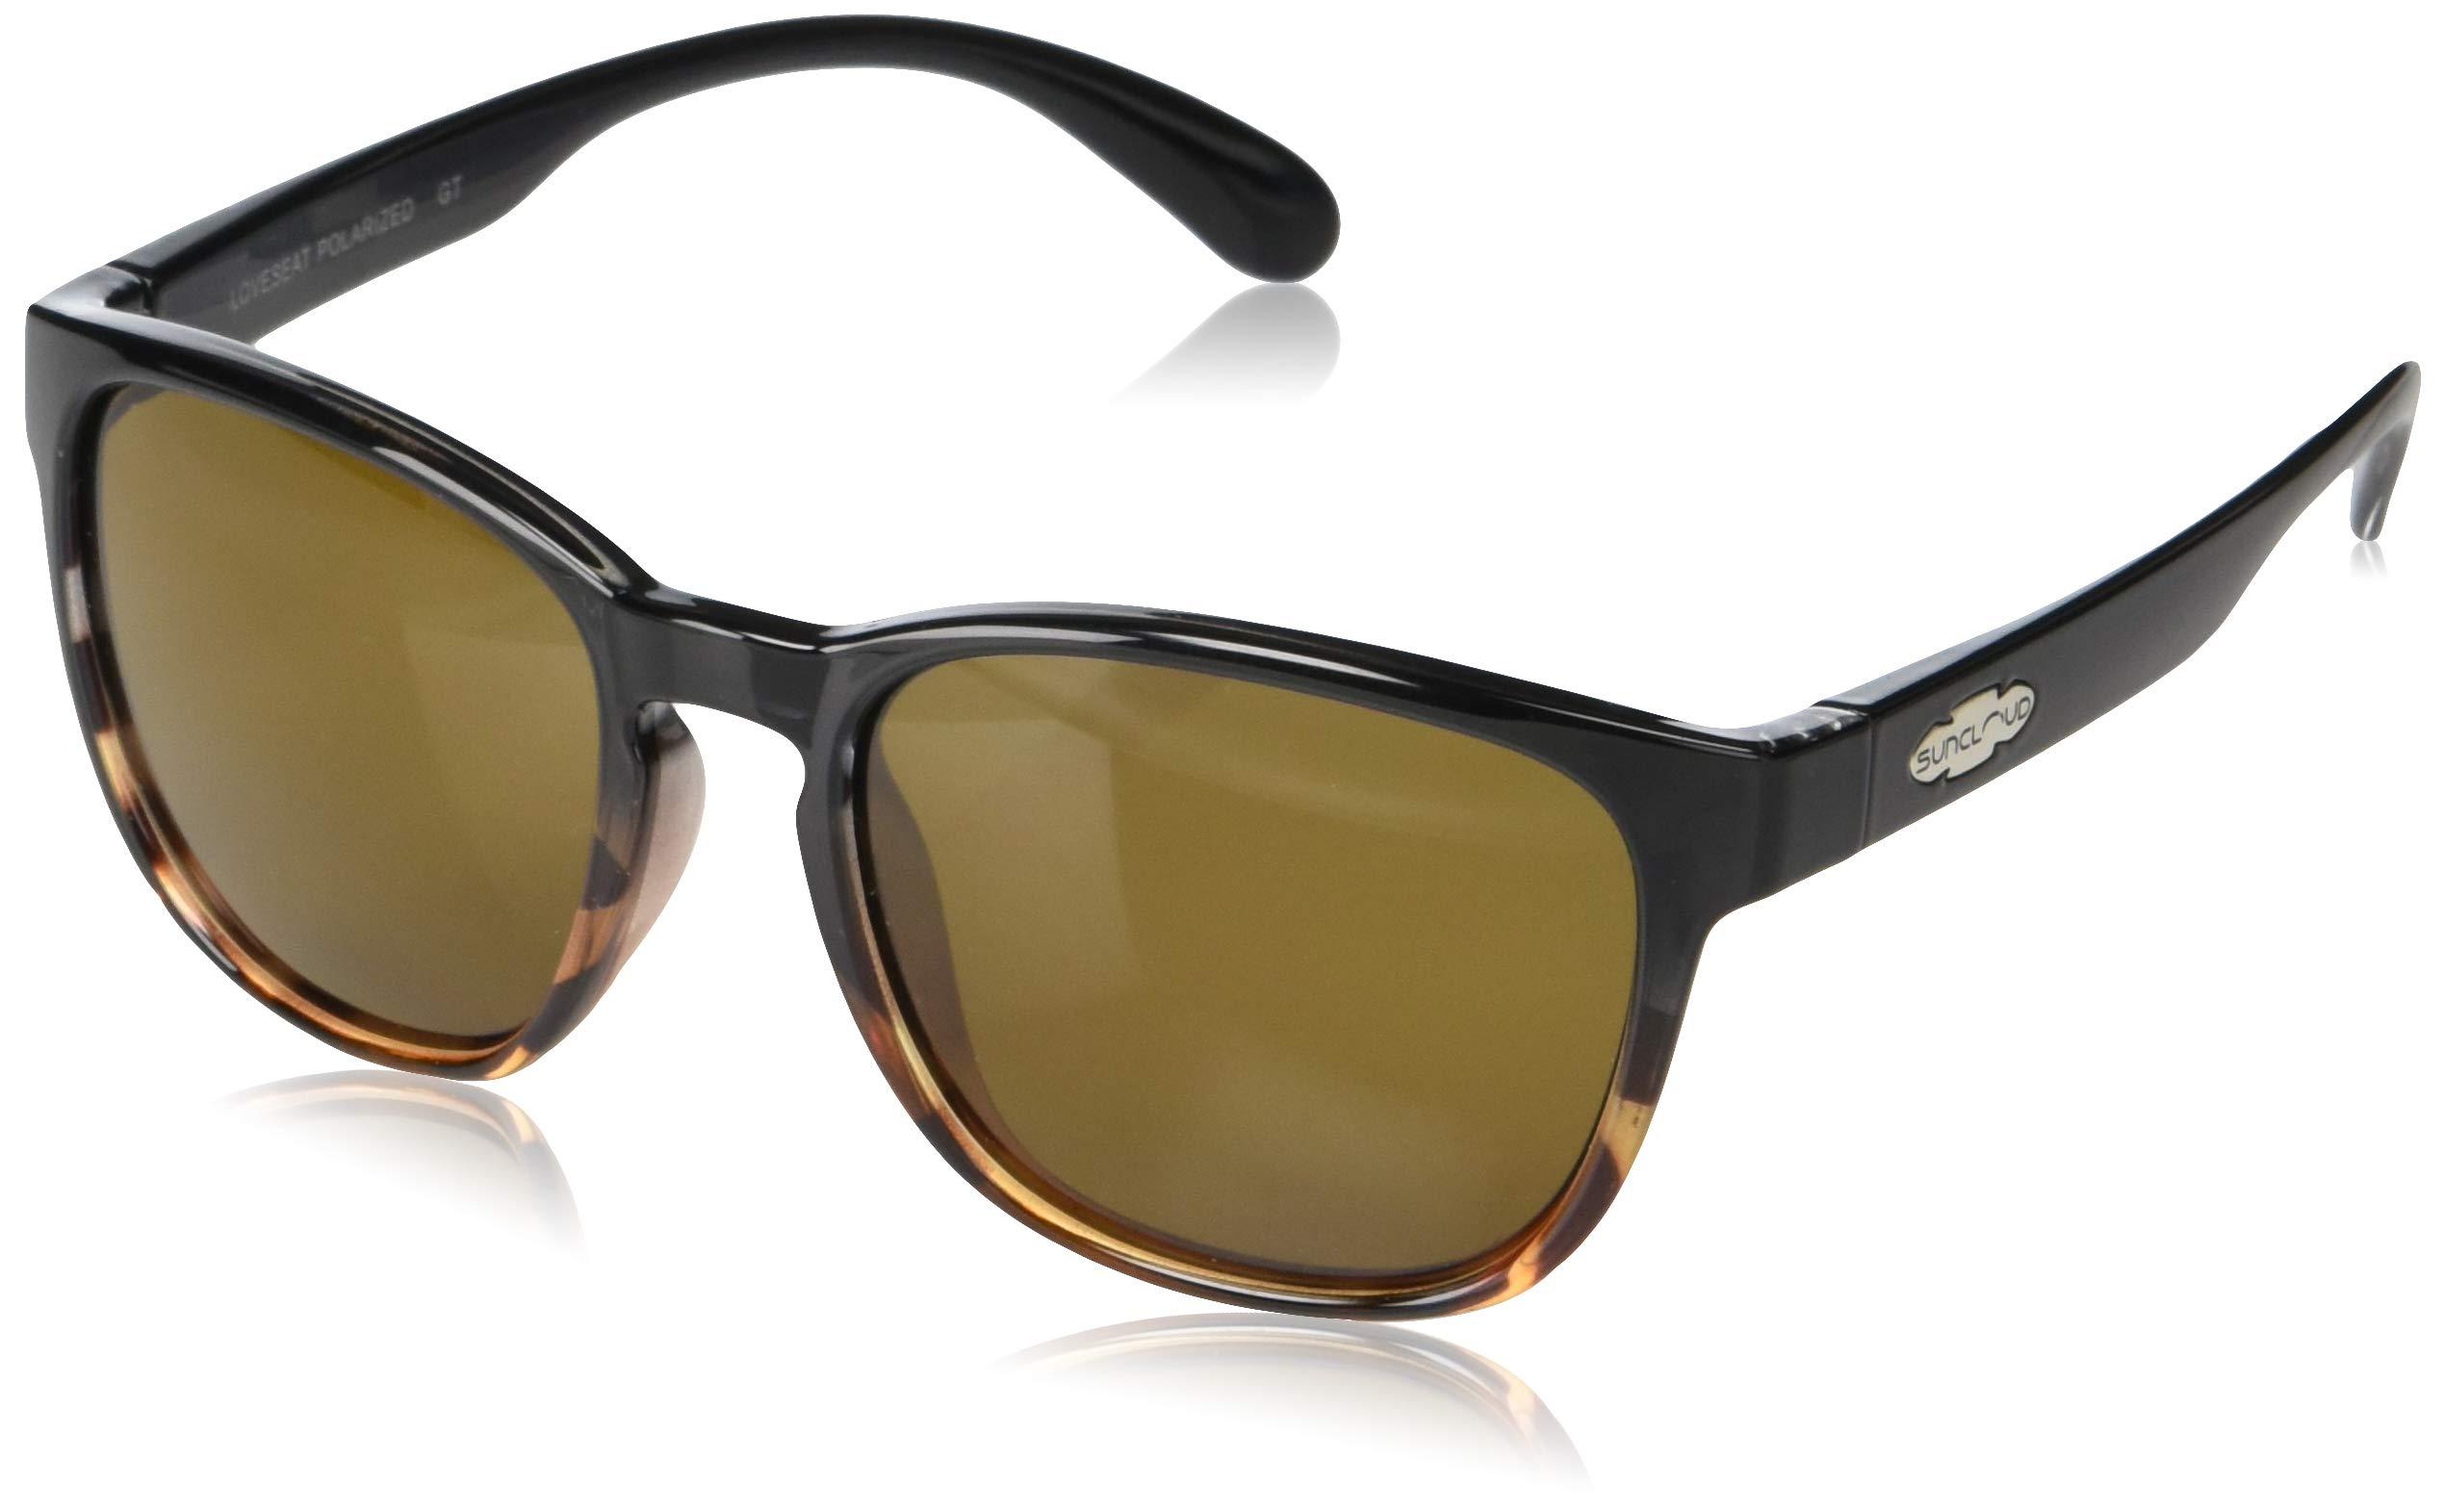 Suncloud Loveseat Sunglasses, Black Tortoise Fade, Brown